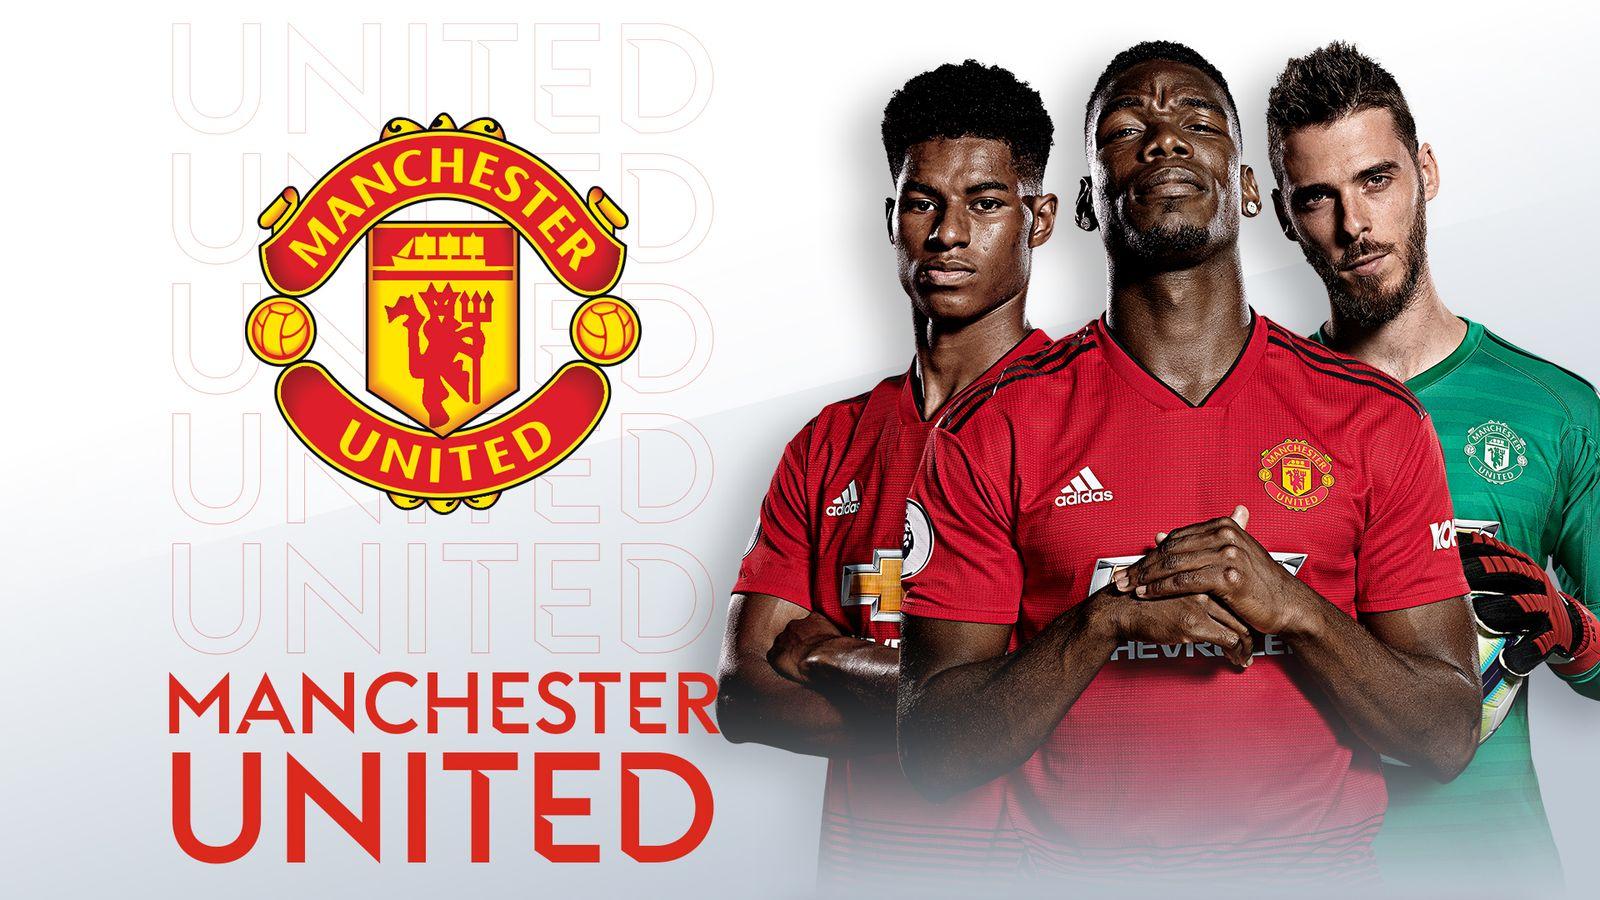 Man Utd Fixtures Premier League 2019 20 Football News Sky Sports